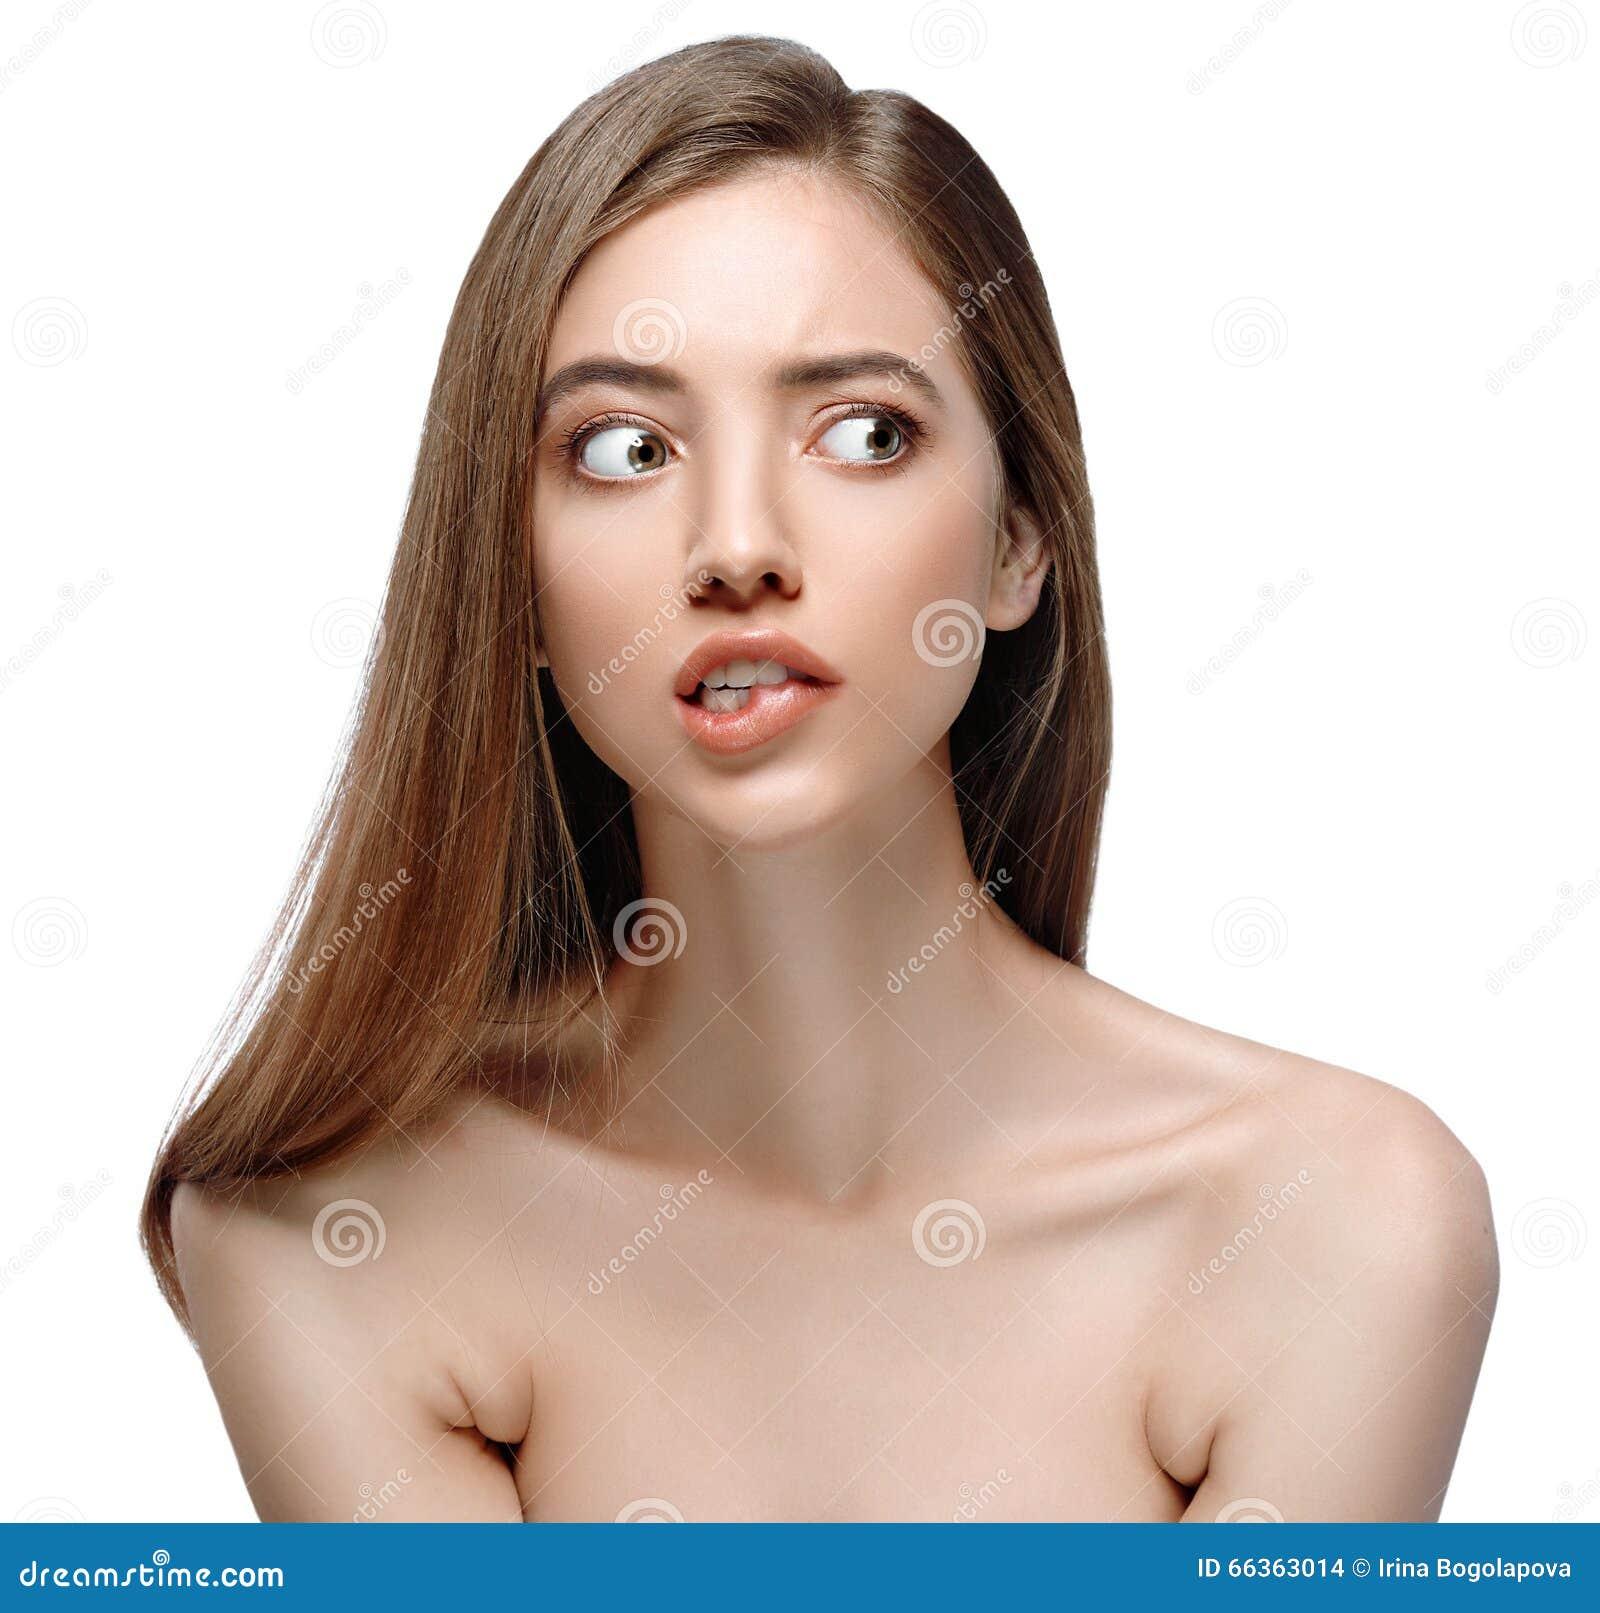 0117 open mouth facial wdw 9